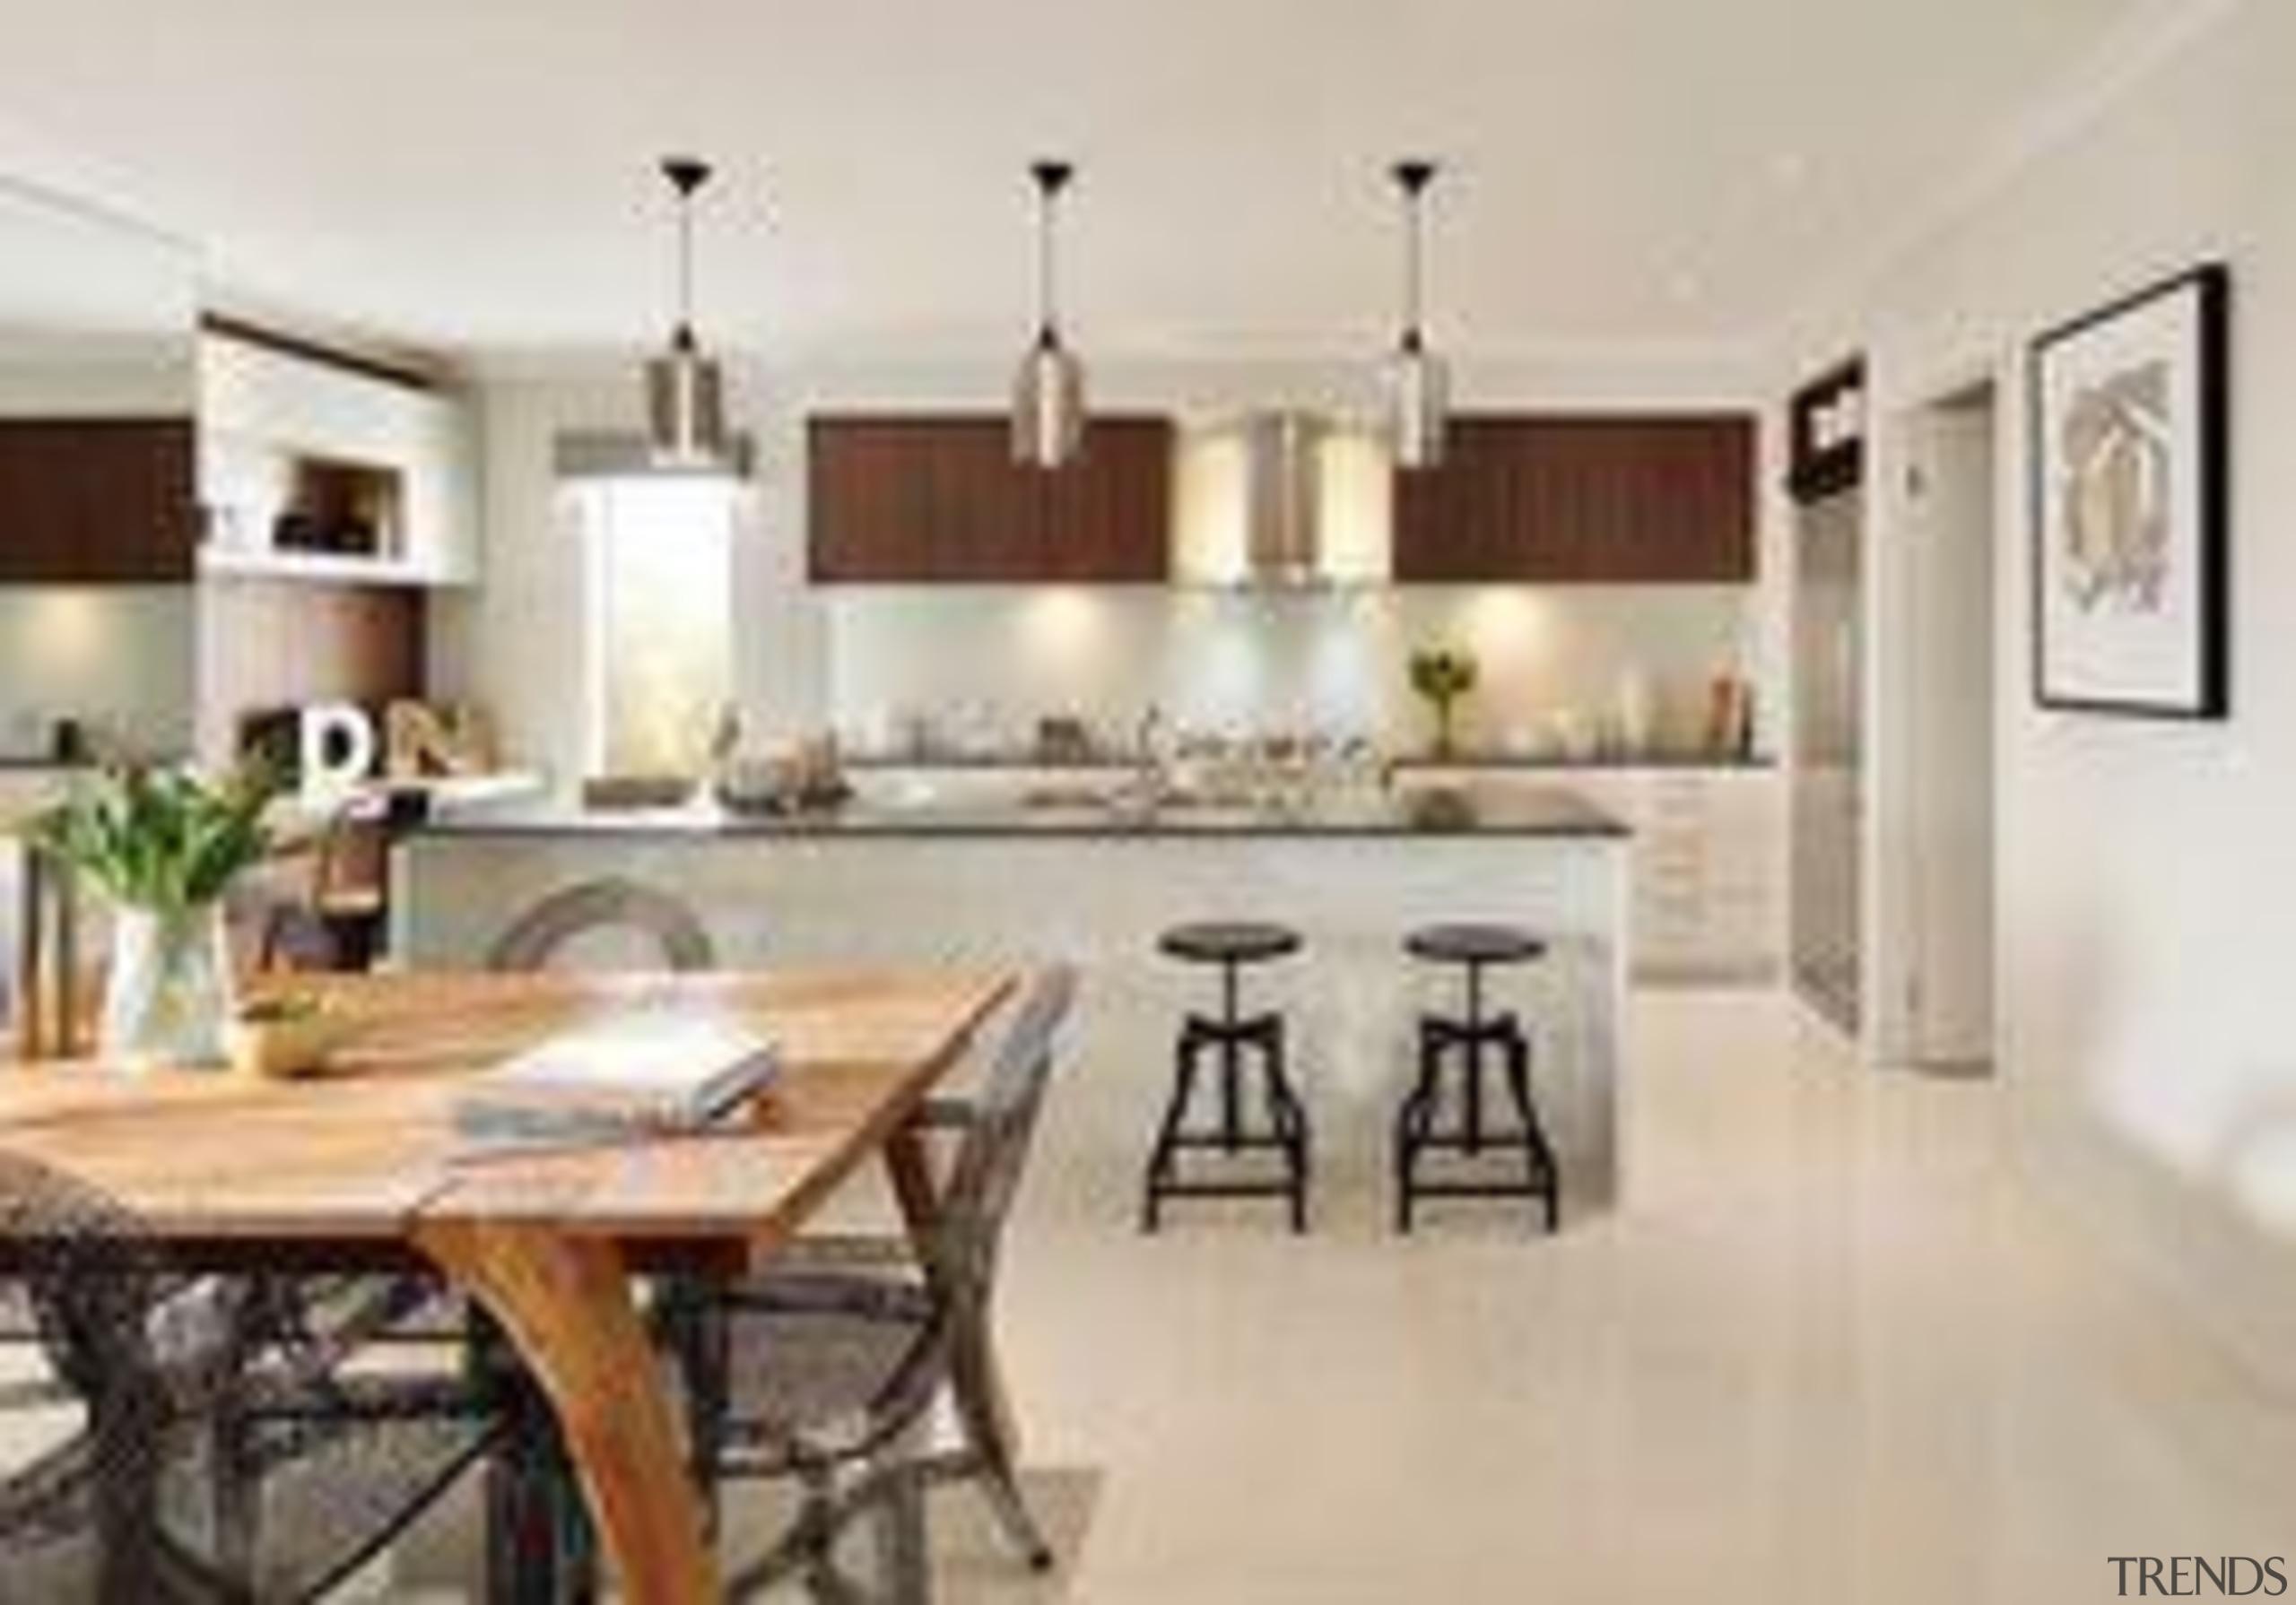 Carlisle Homes Raven - Raven™ - dining room dining room, floor, flooring, interior design, kitchen, property, real estate, table, gray